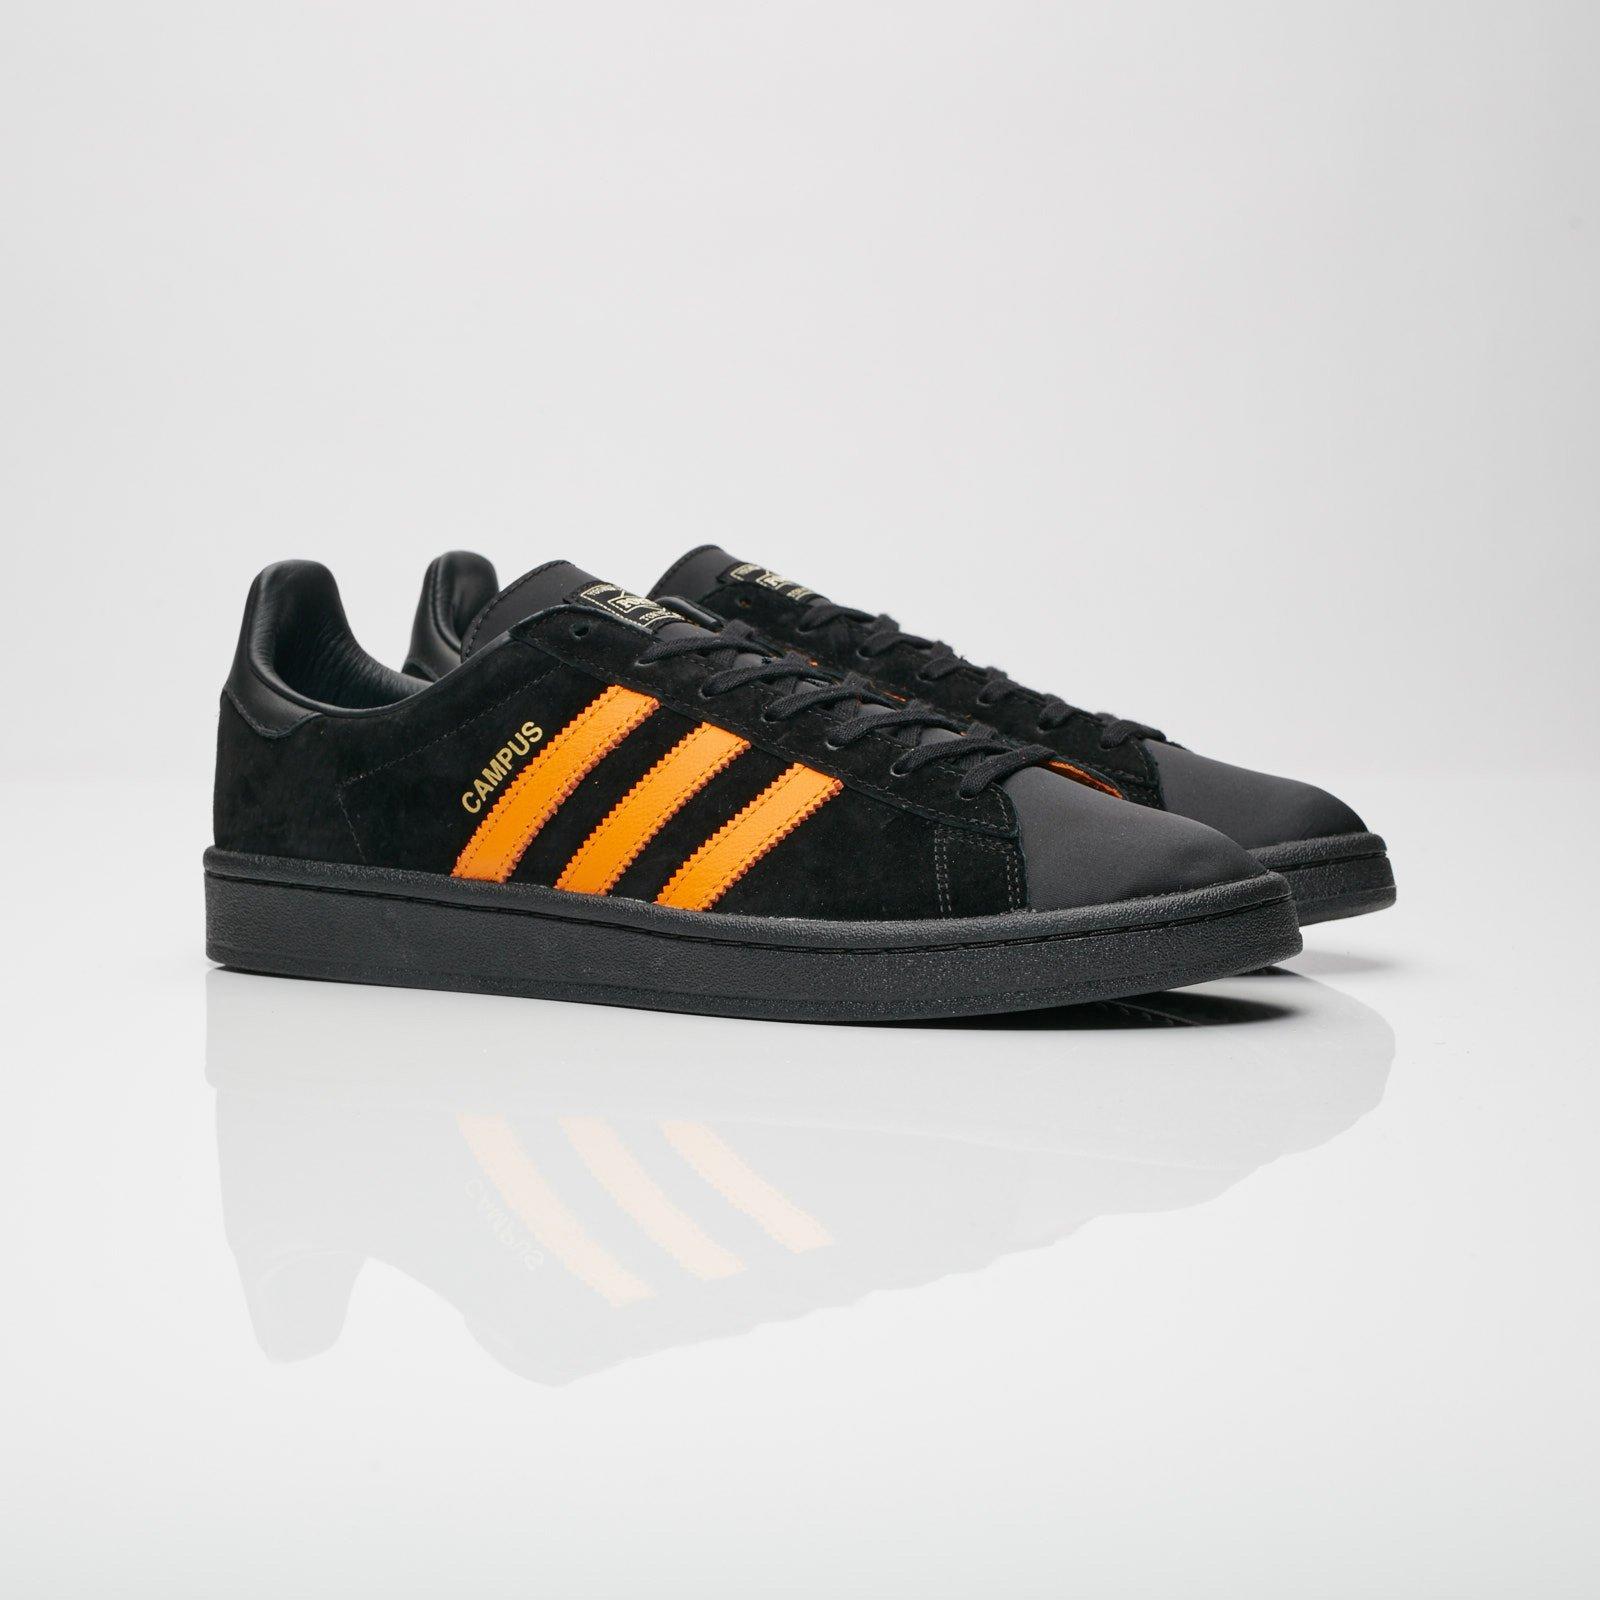 Porter X Adidas Campus Shoes Black B28143